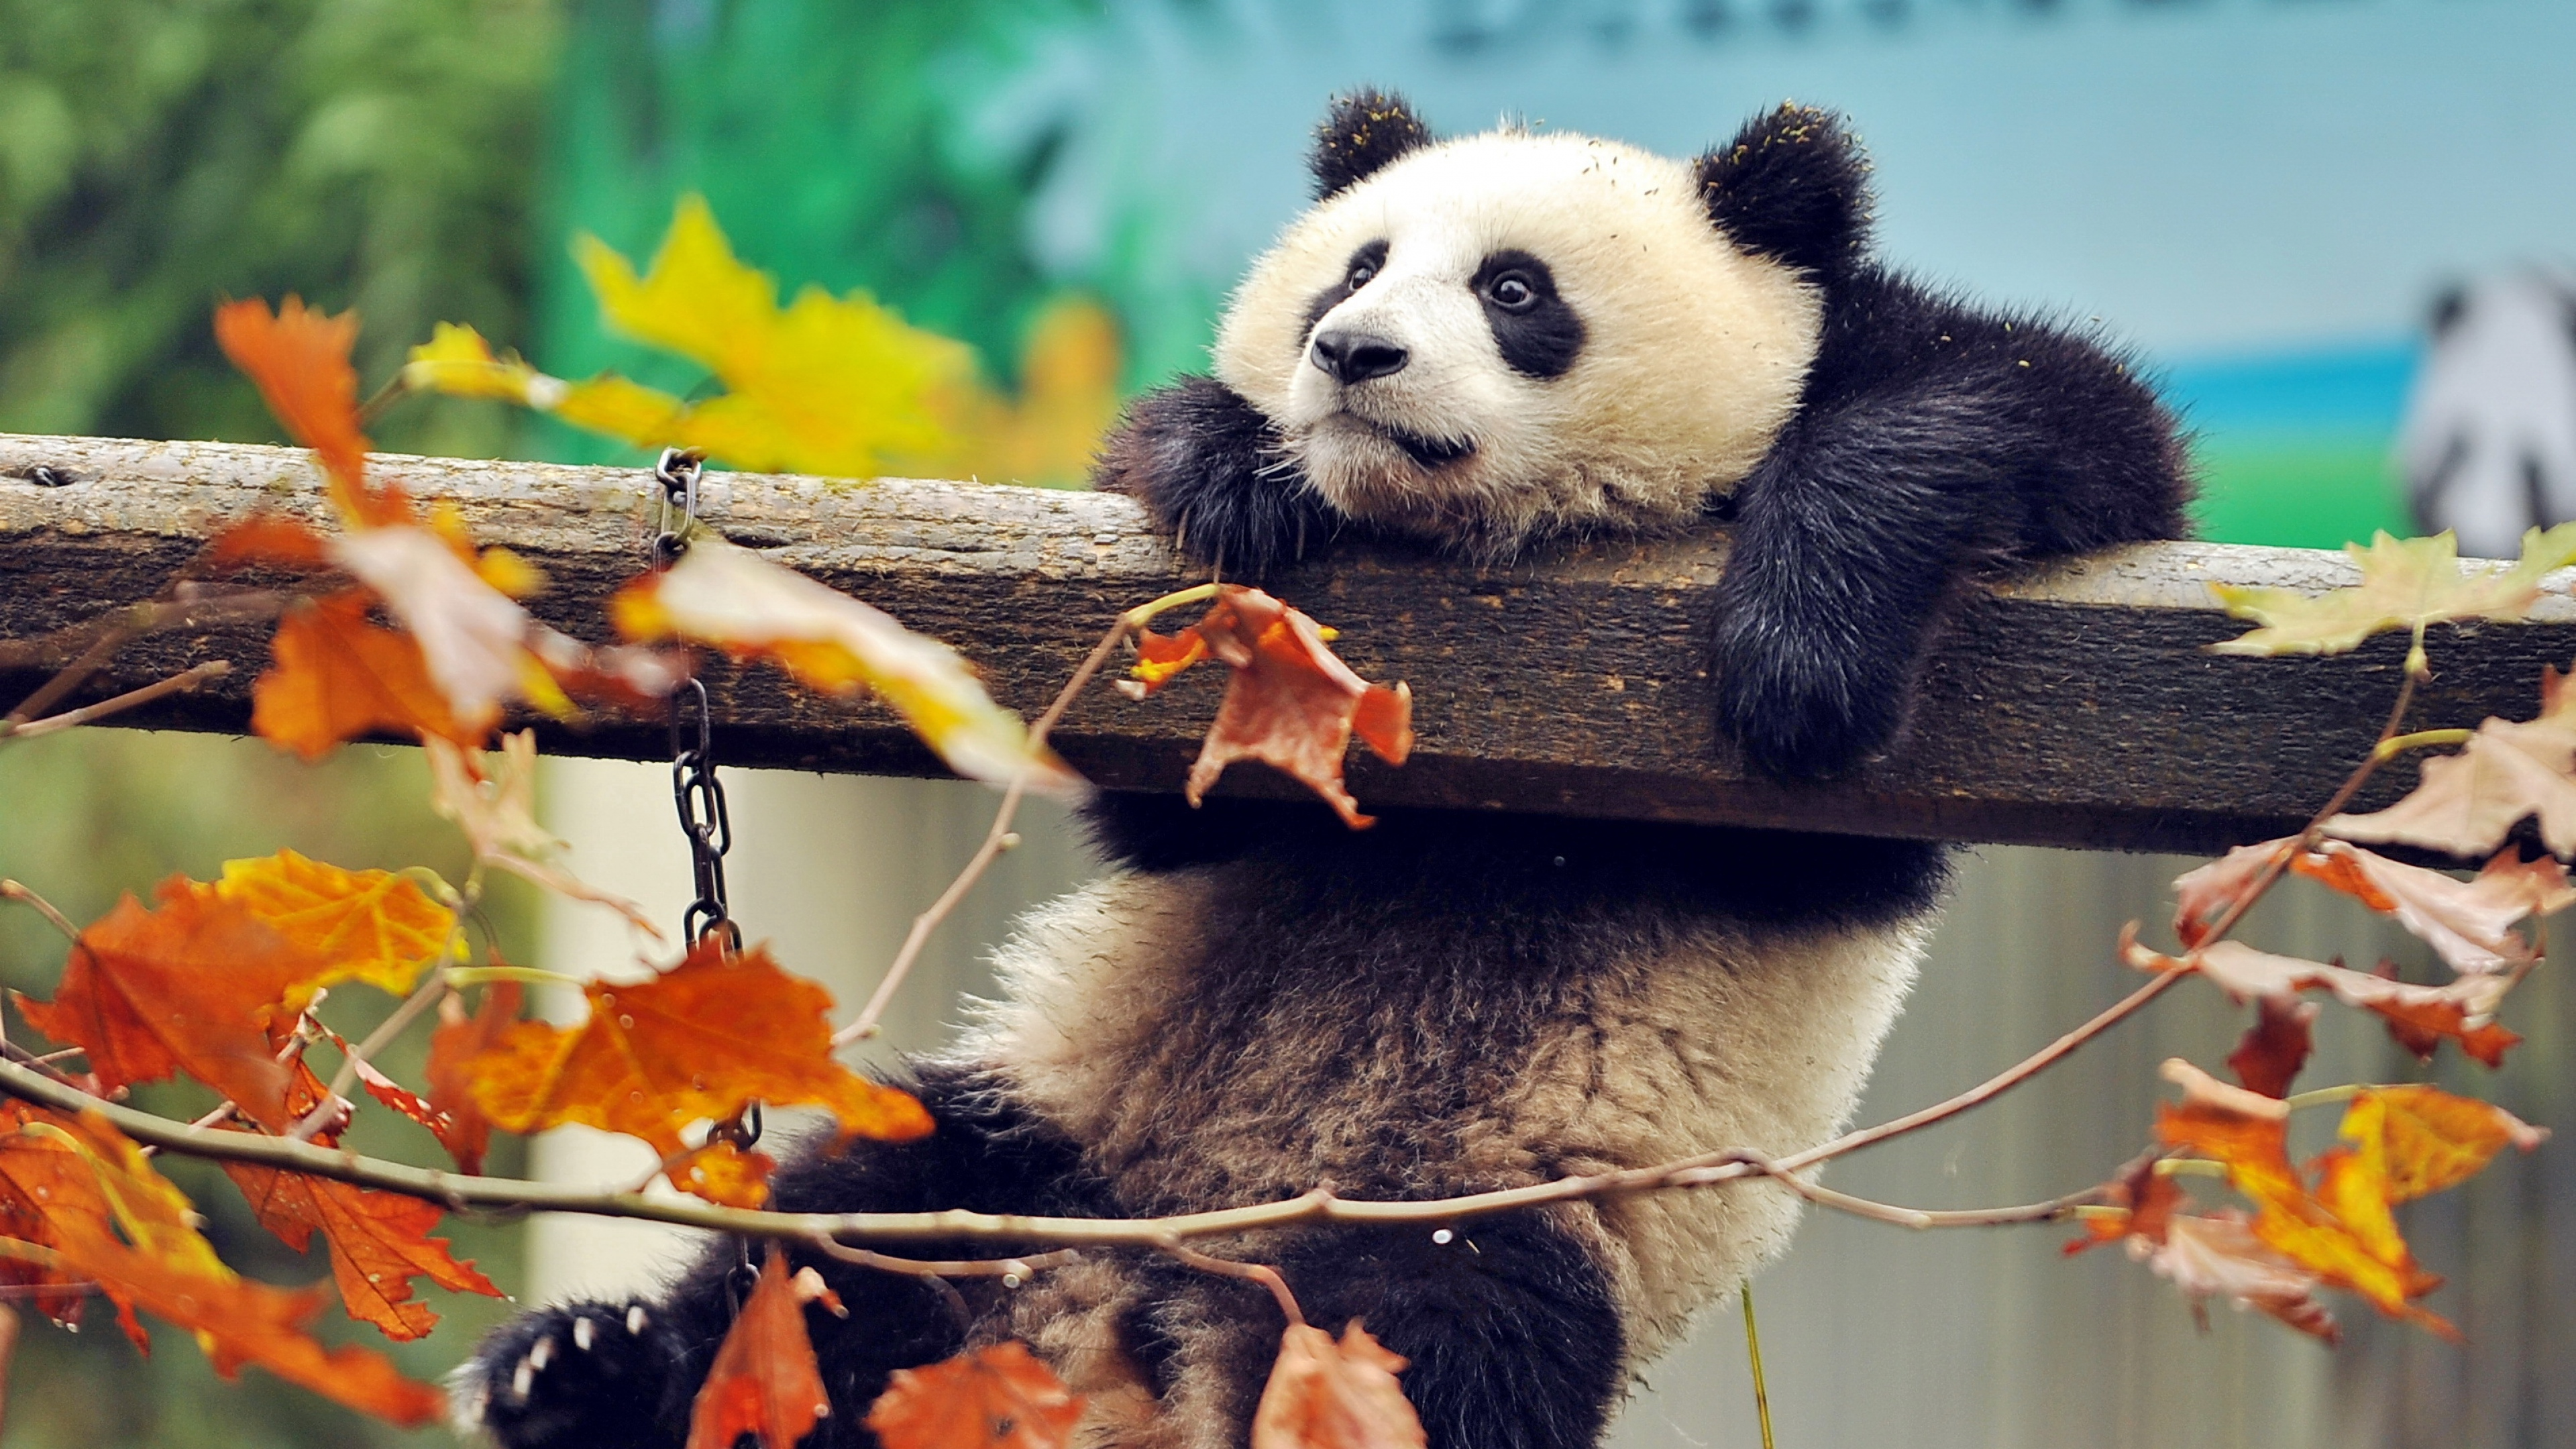 Cute Panda (2560x1600 Resolution)